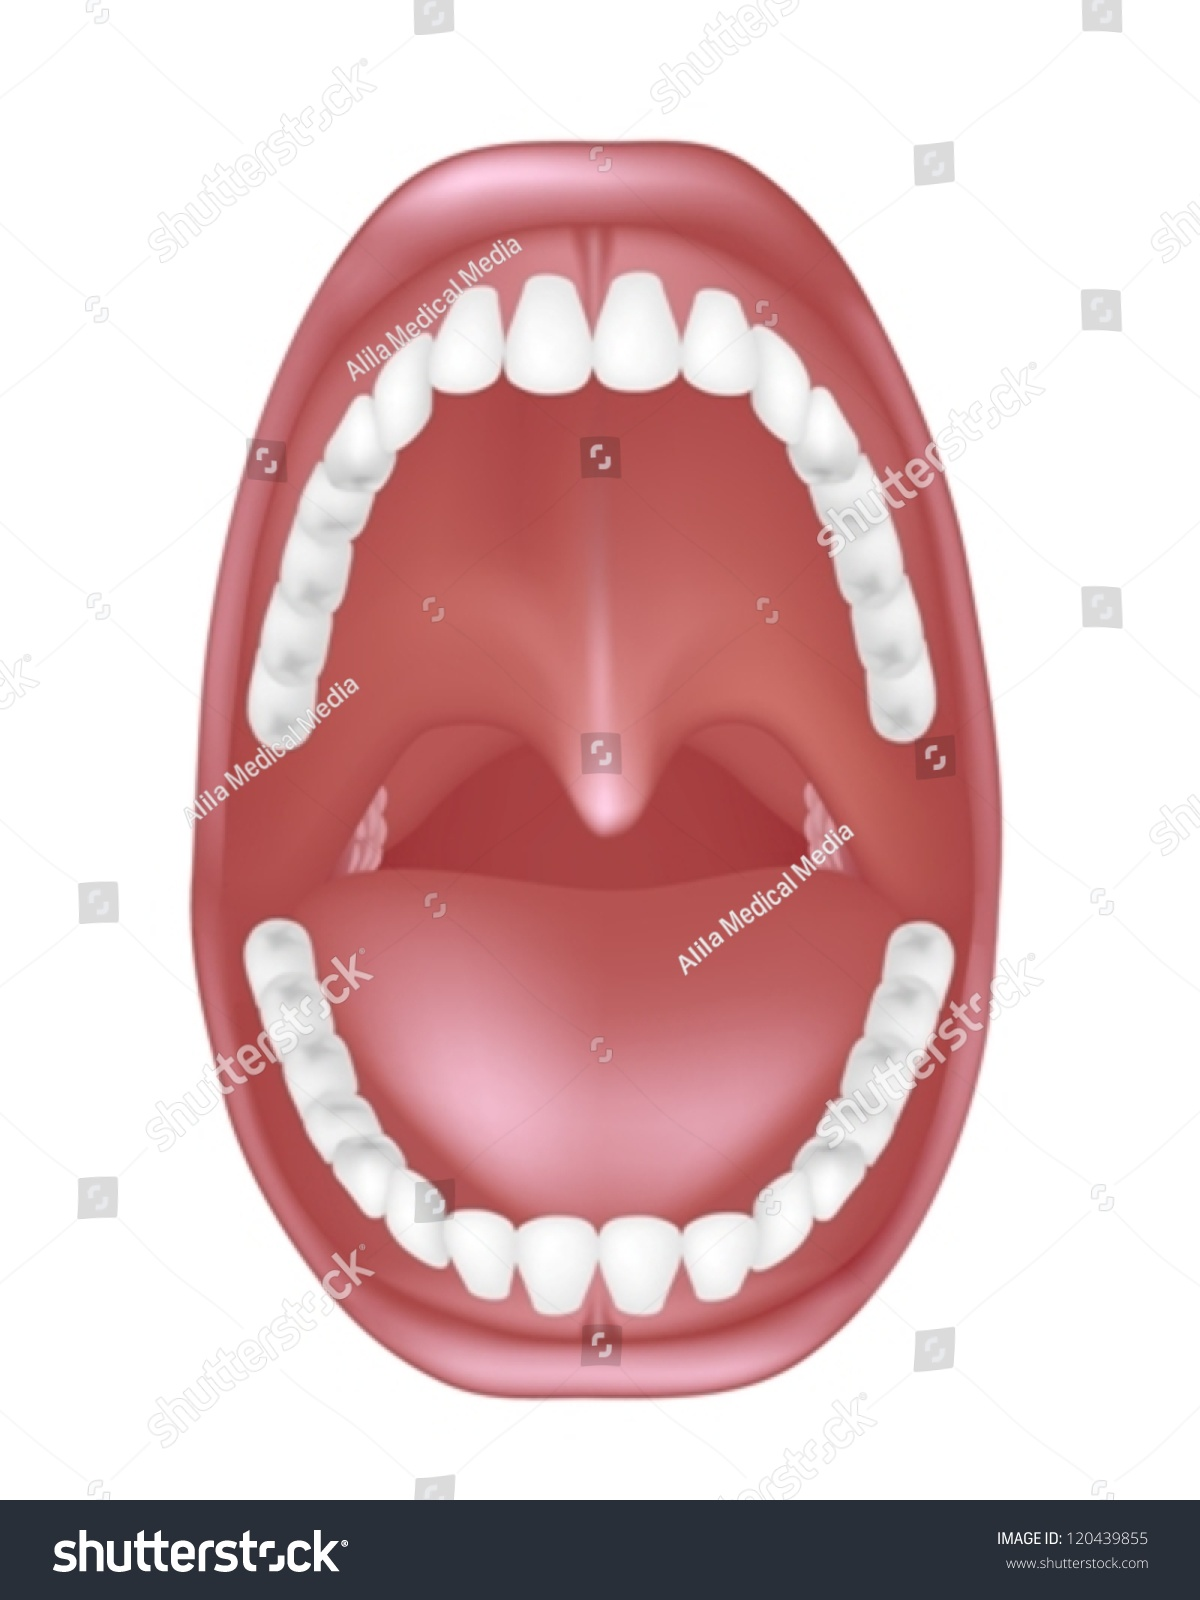 Mouth Anatomy Ez Canvas